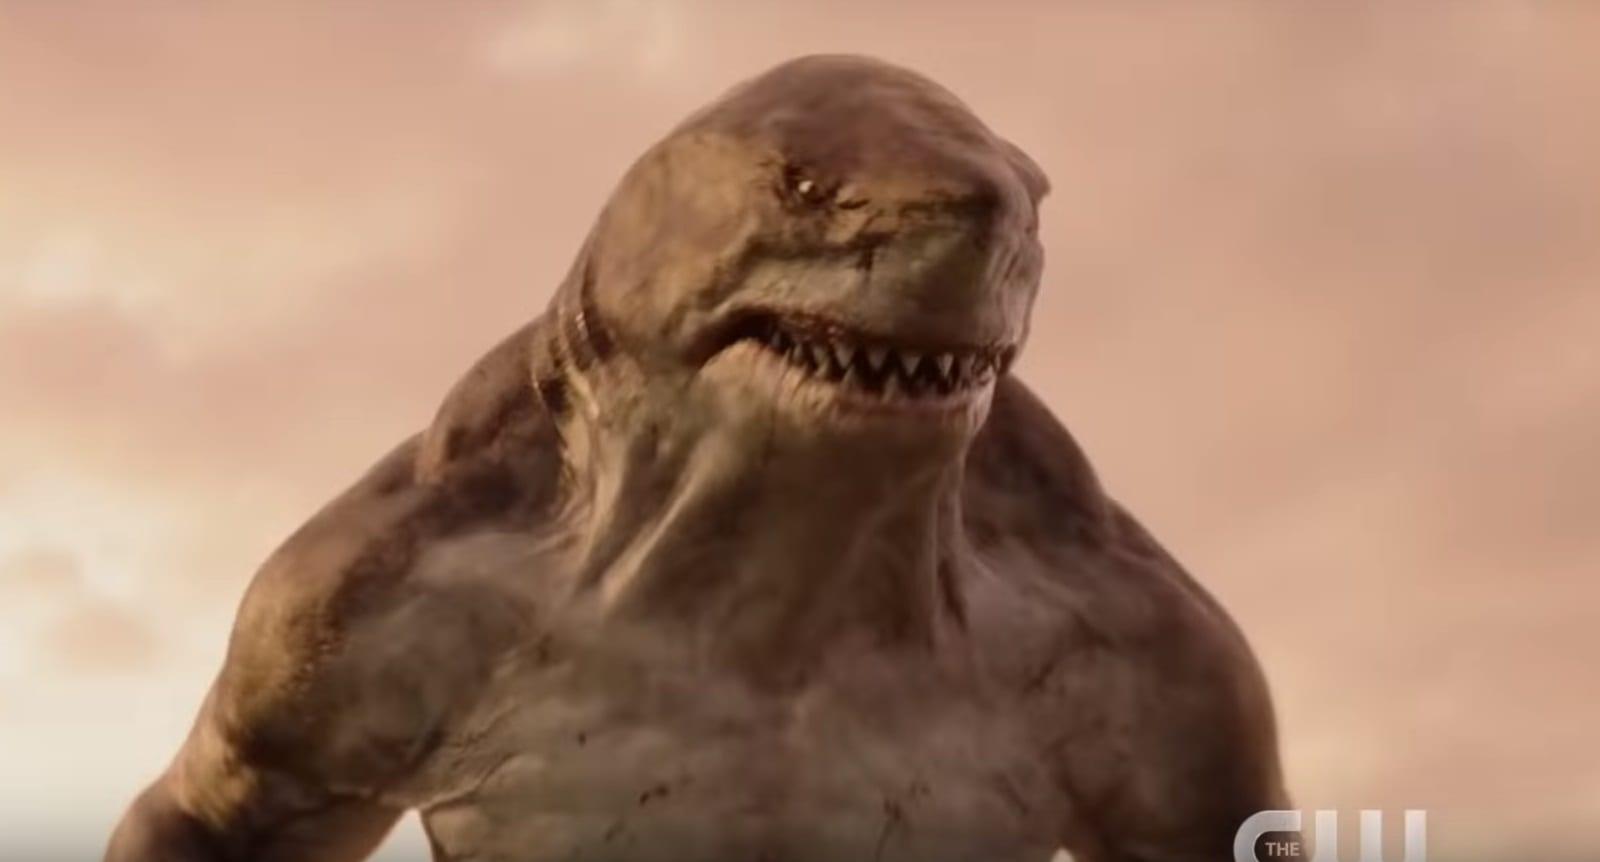 King Shark vs. Gorilla Grodd in promo for The Flash Season 5 Episode 15